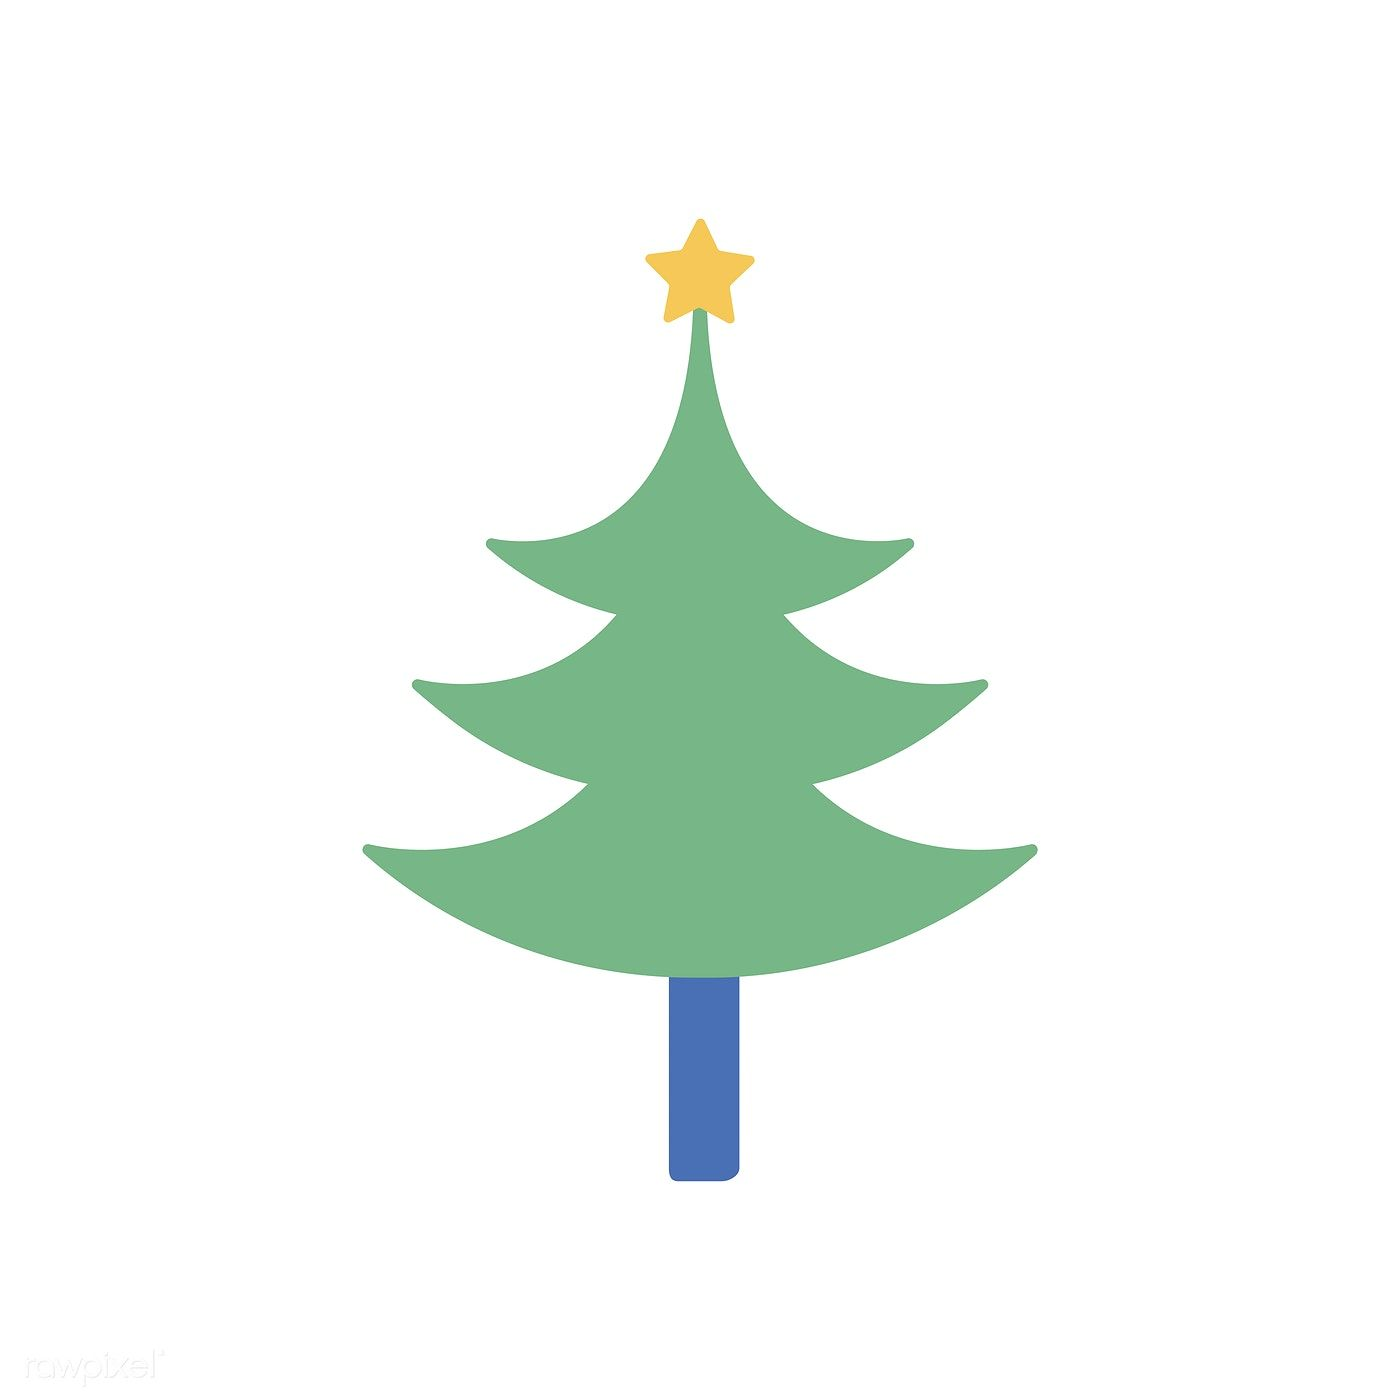 Illustration Of Christmas Tree Icon Free Image By Rawpixel Com Tree Icon Christmas Tree Clipart Christmas Tree